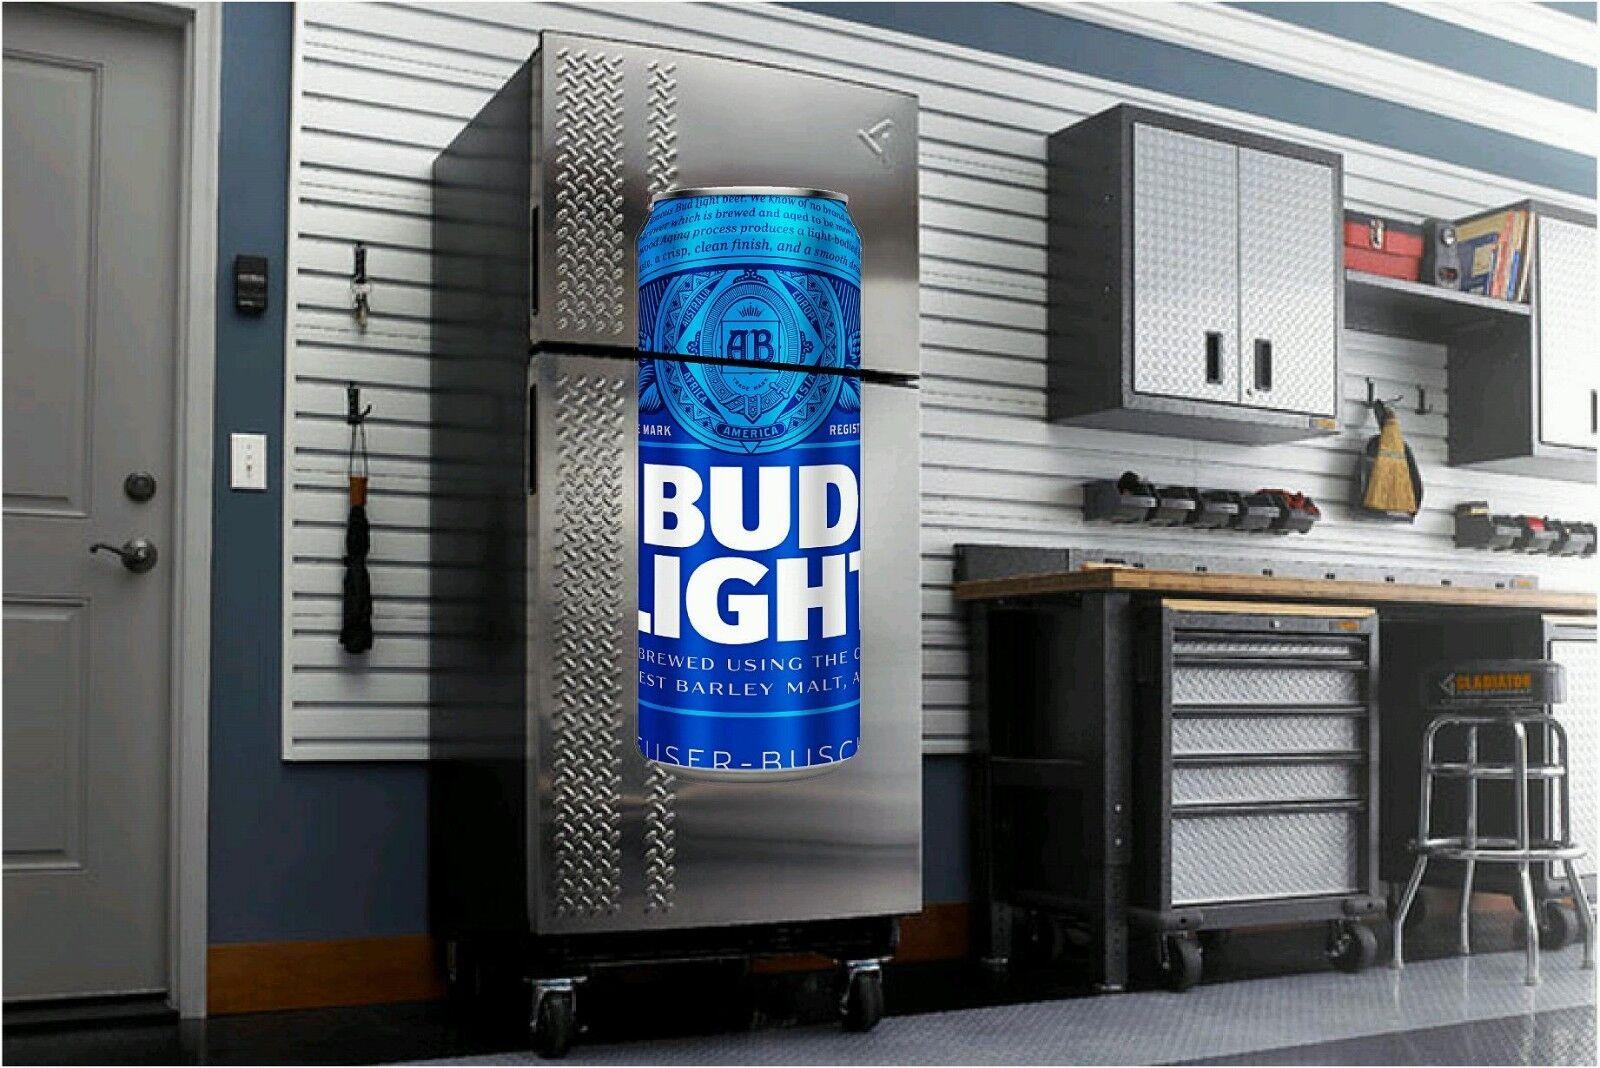 Bud Light Bud Beer fathead wall sticker 4' dorm room man cave refrigerator